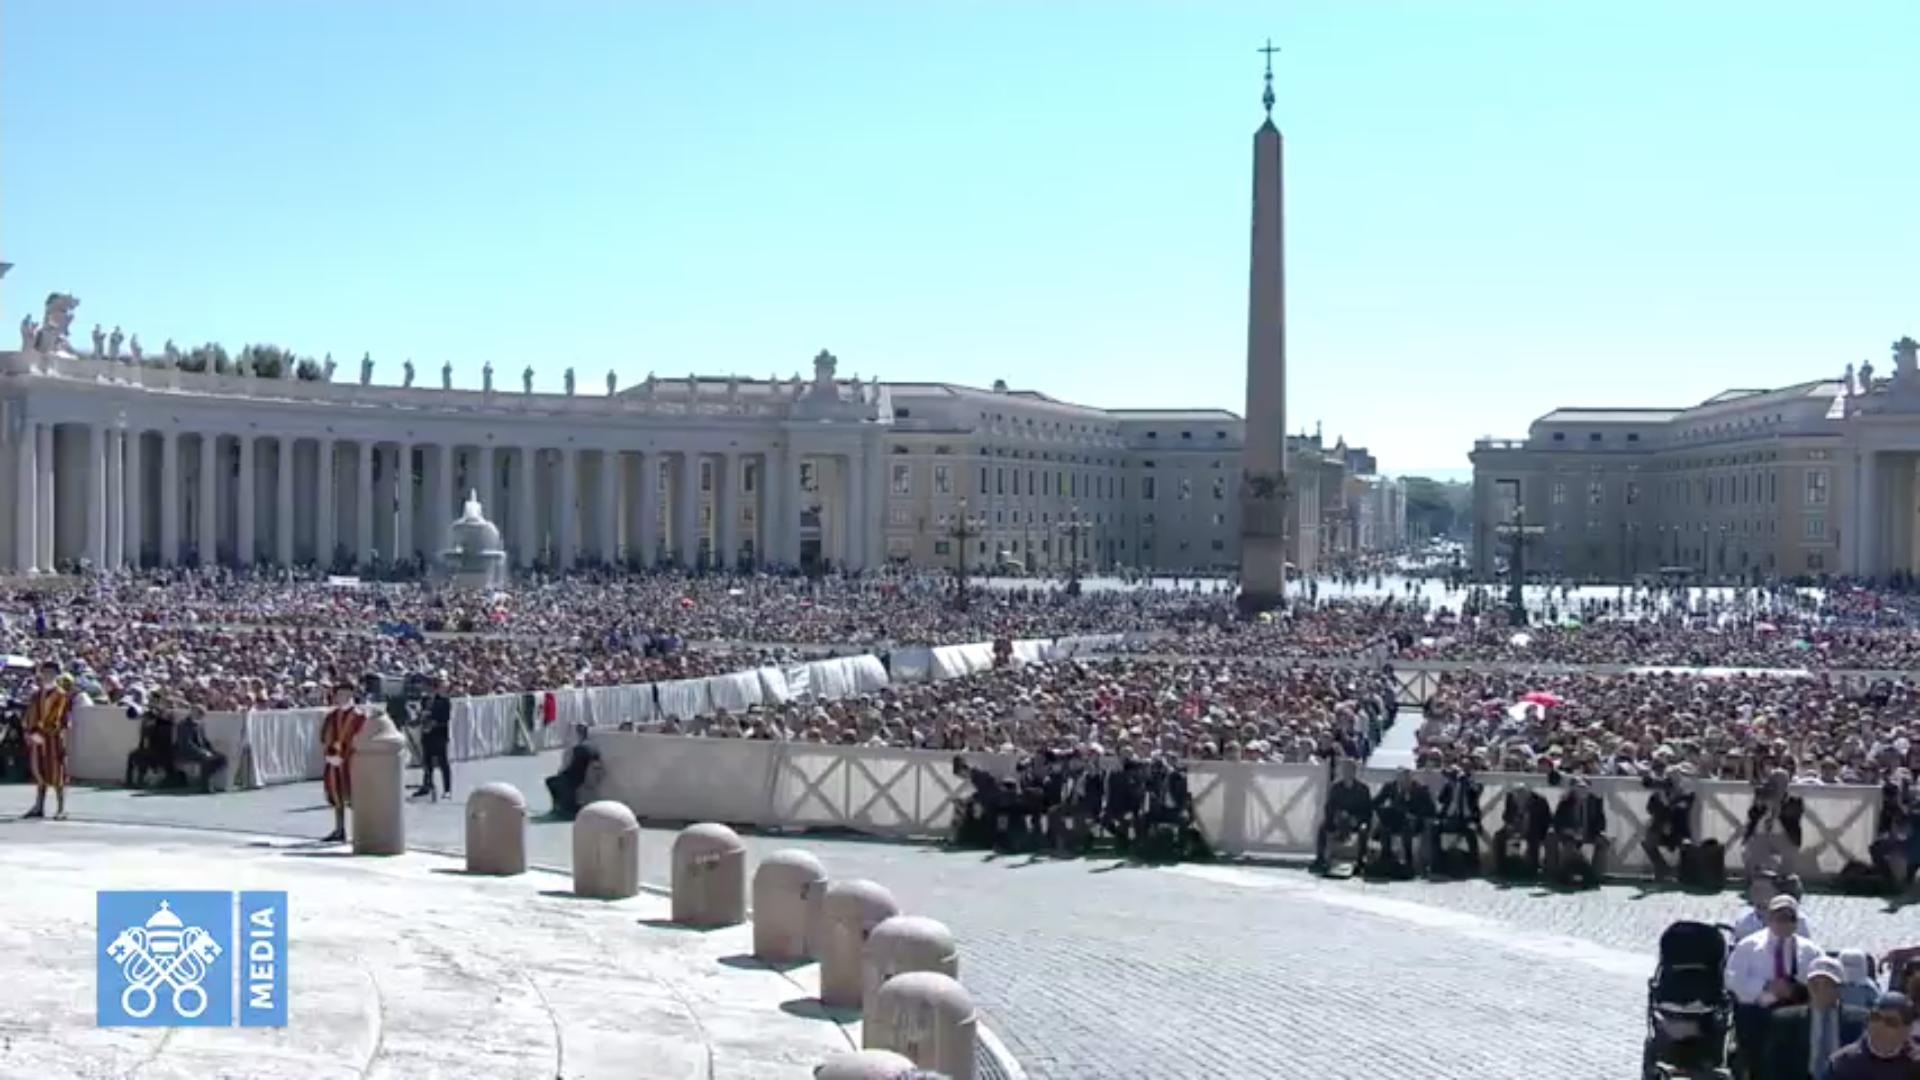 Audience 27/6/2018 capture @ Vatican Media